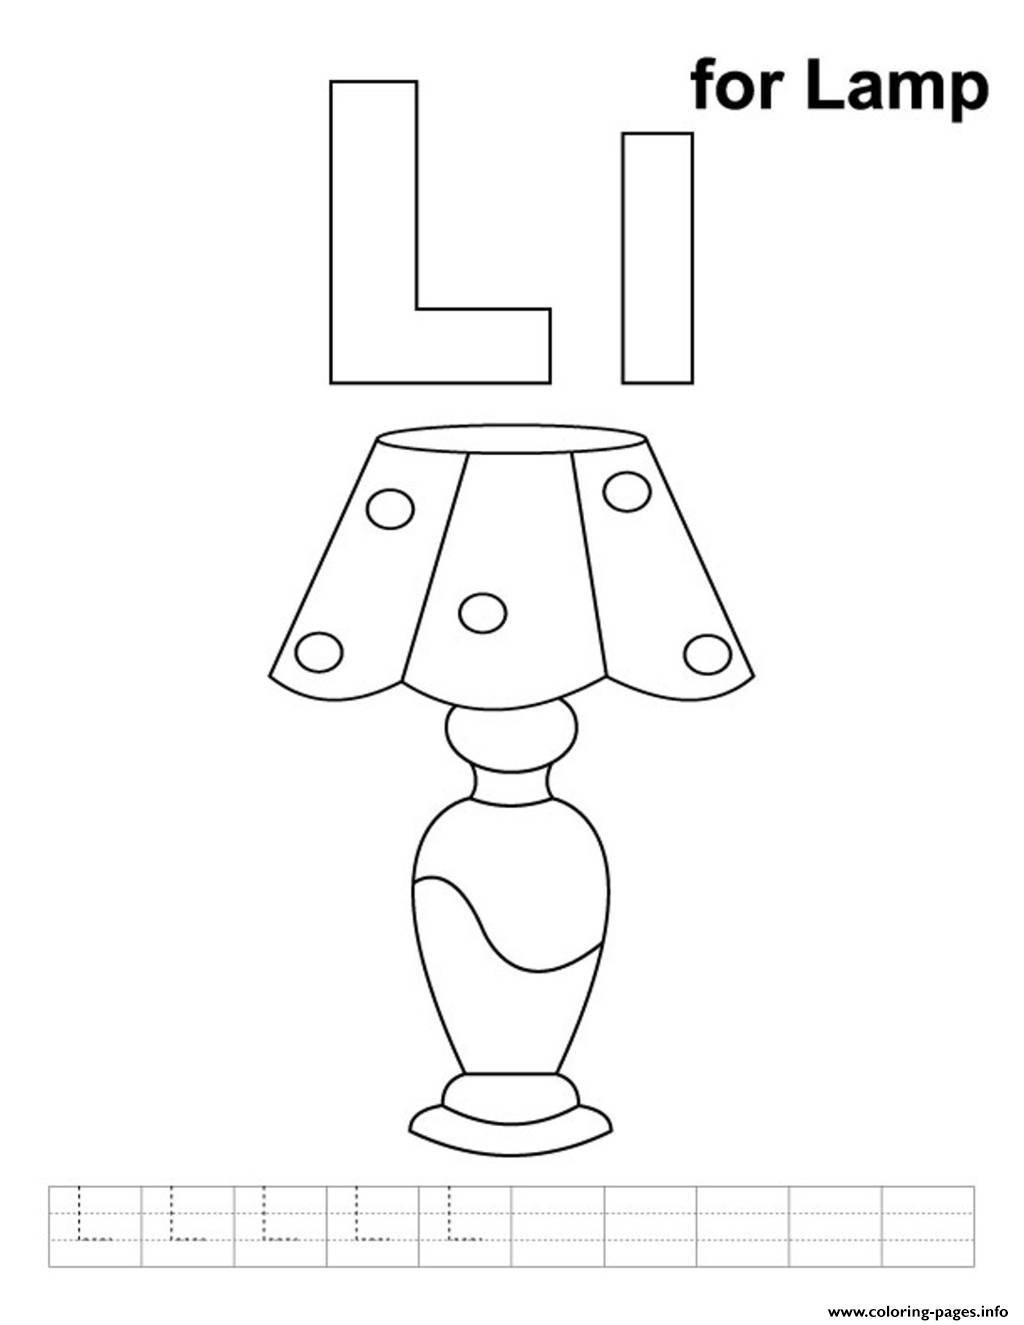 Alphabet S Free Lampe333 Coloring